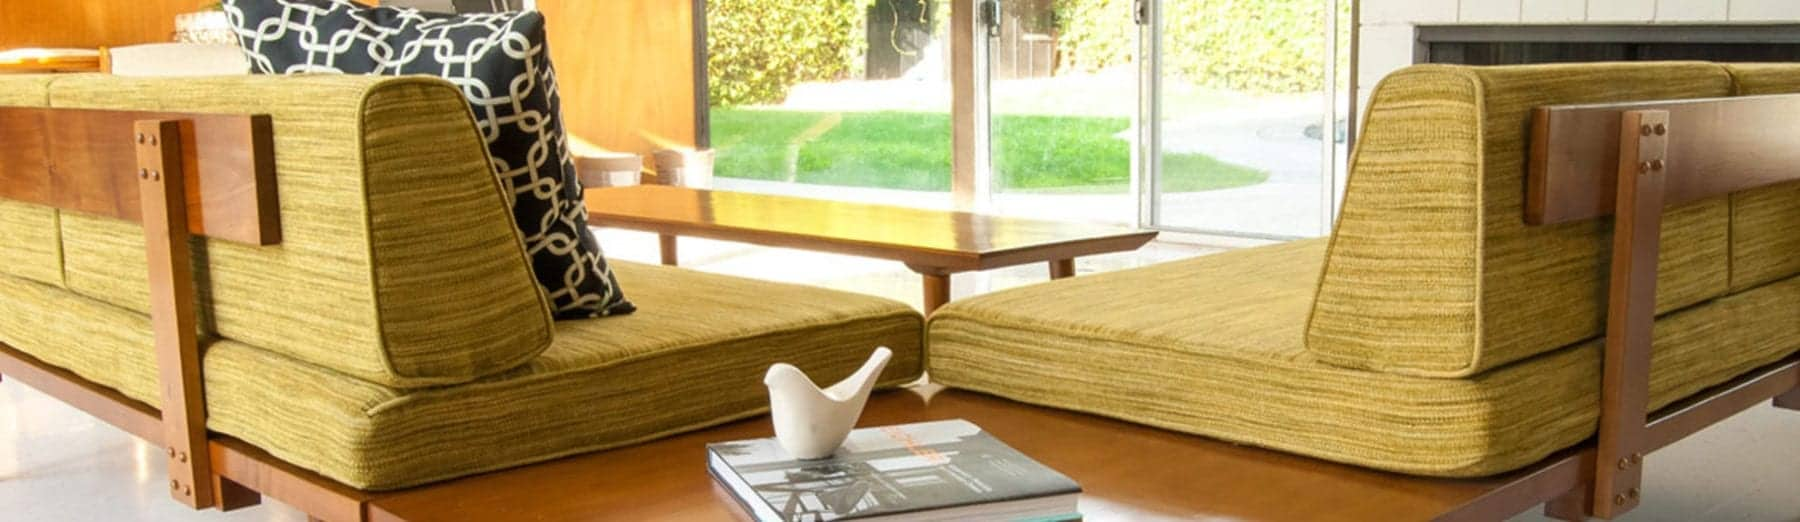 mid century modern daybed sofa - Mid Century Modern Sectional - affordable mid century modern furniture